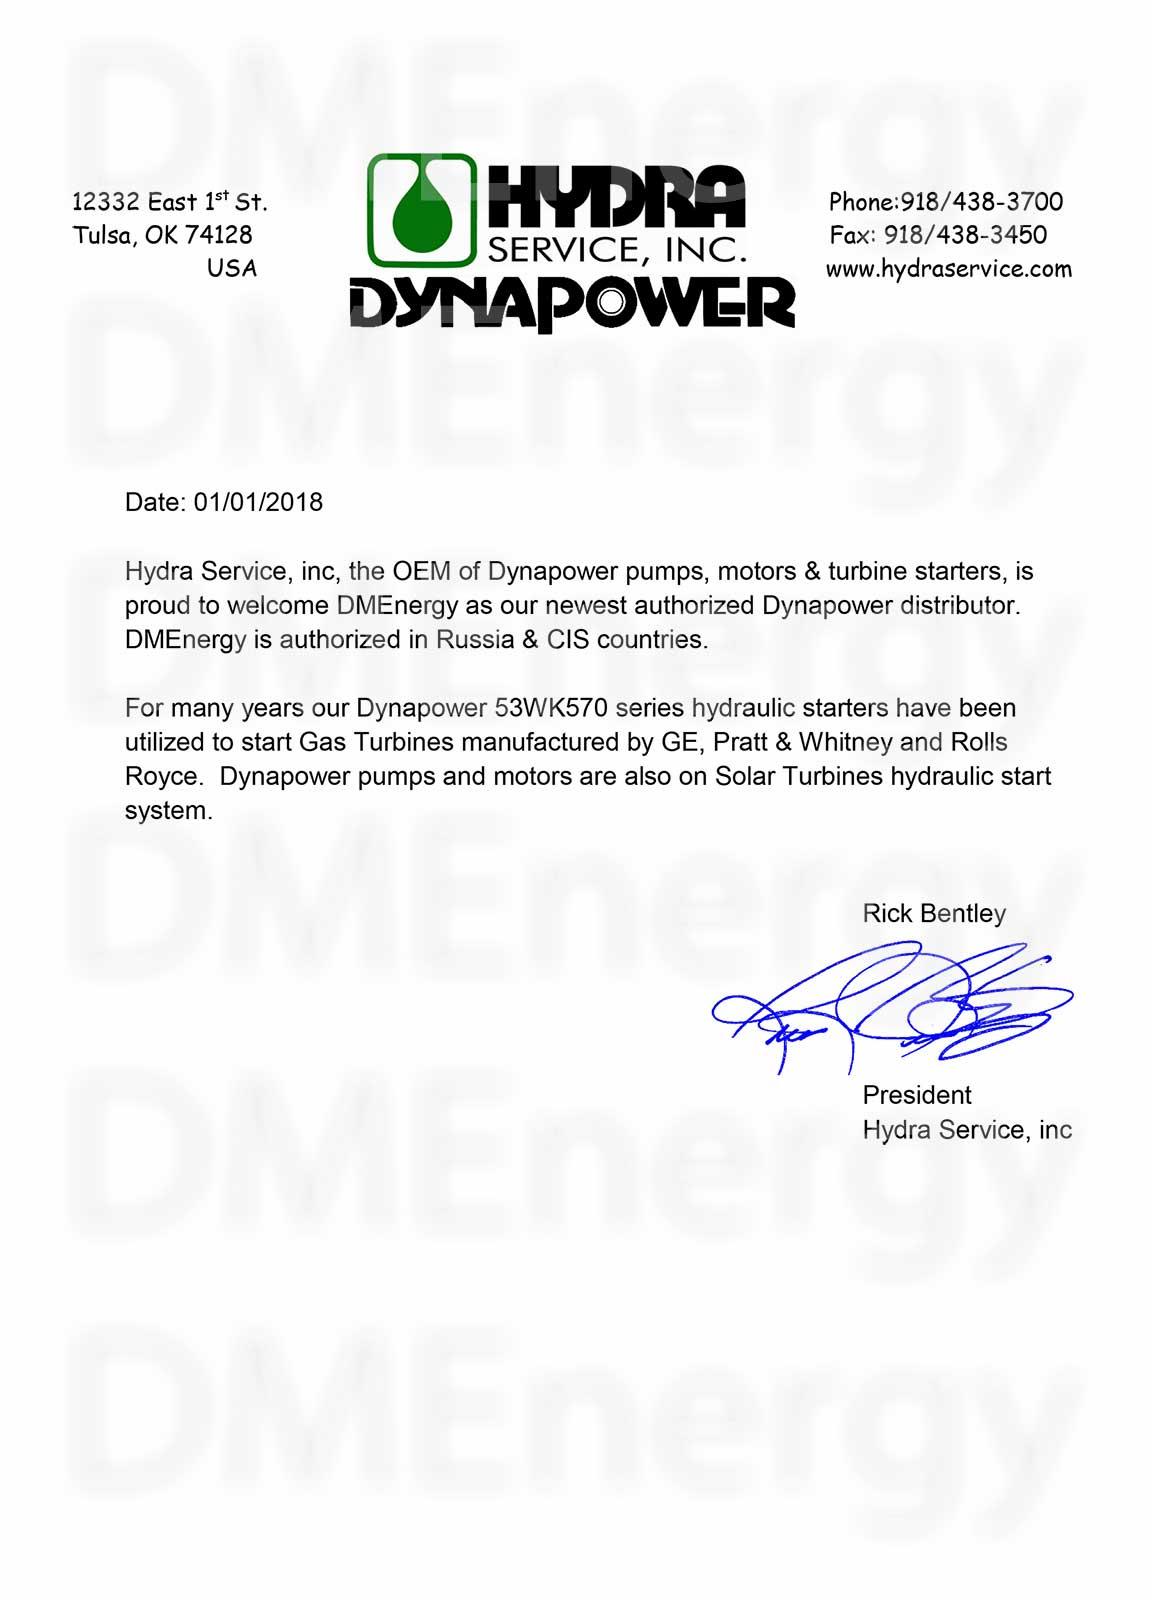 dmenergy-dynapower-large